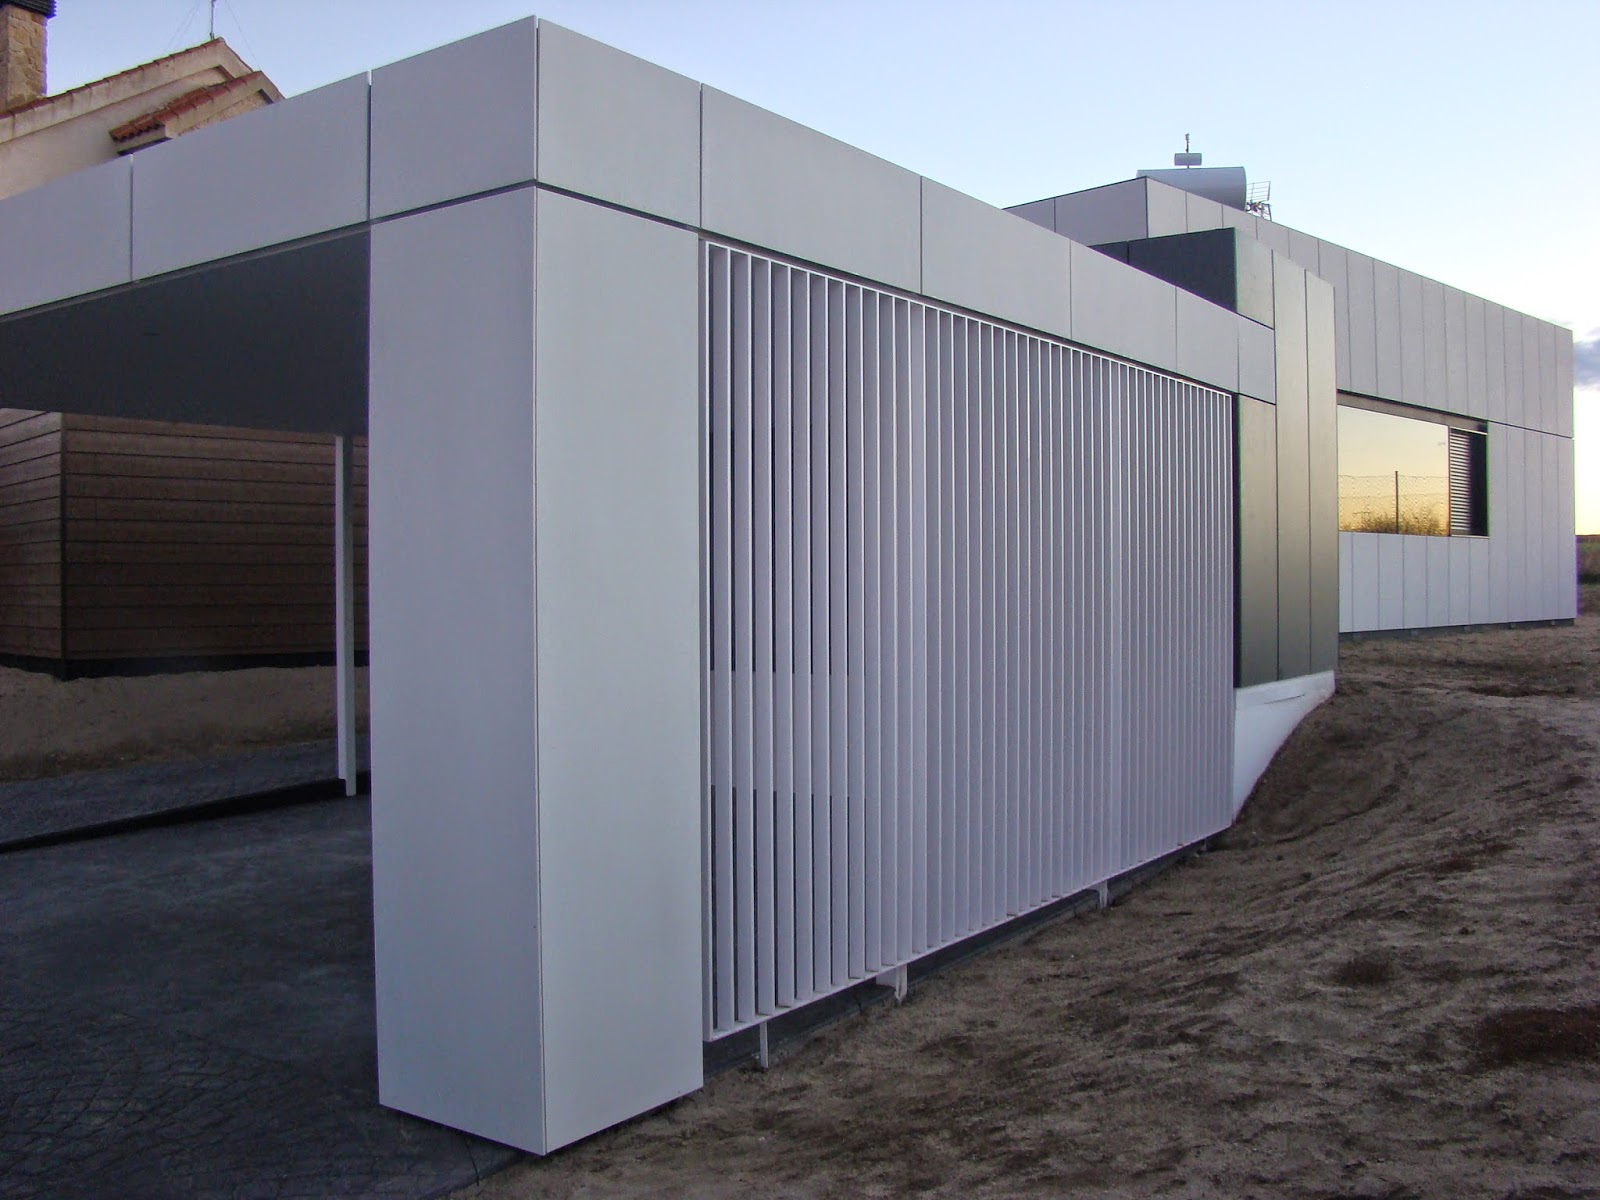 Garaje modular de Resan, modelo abierto